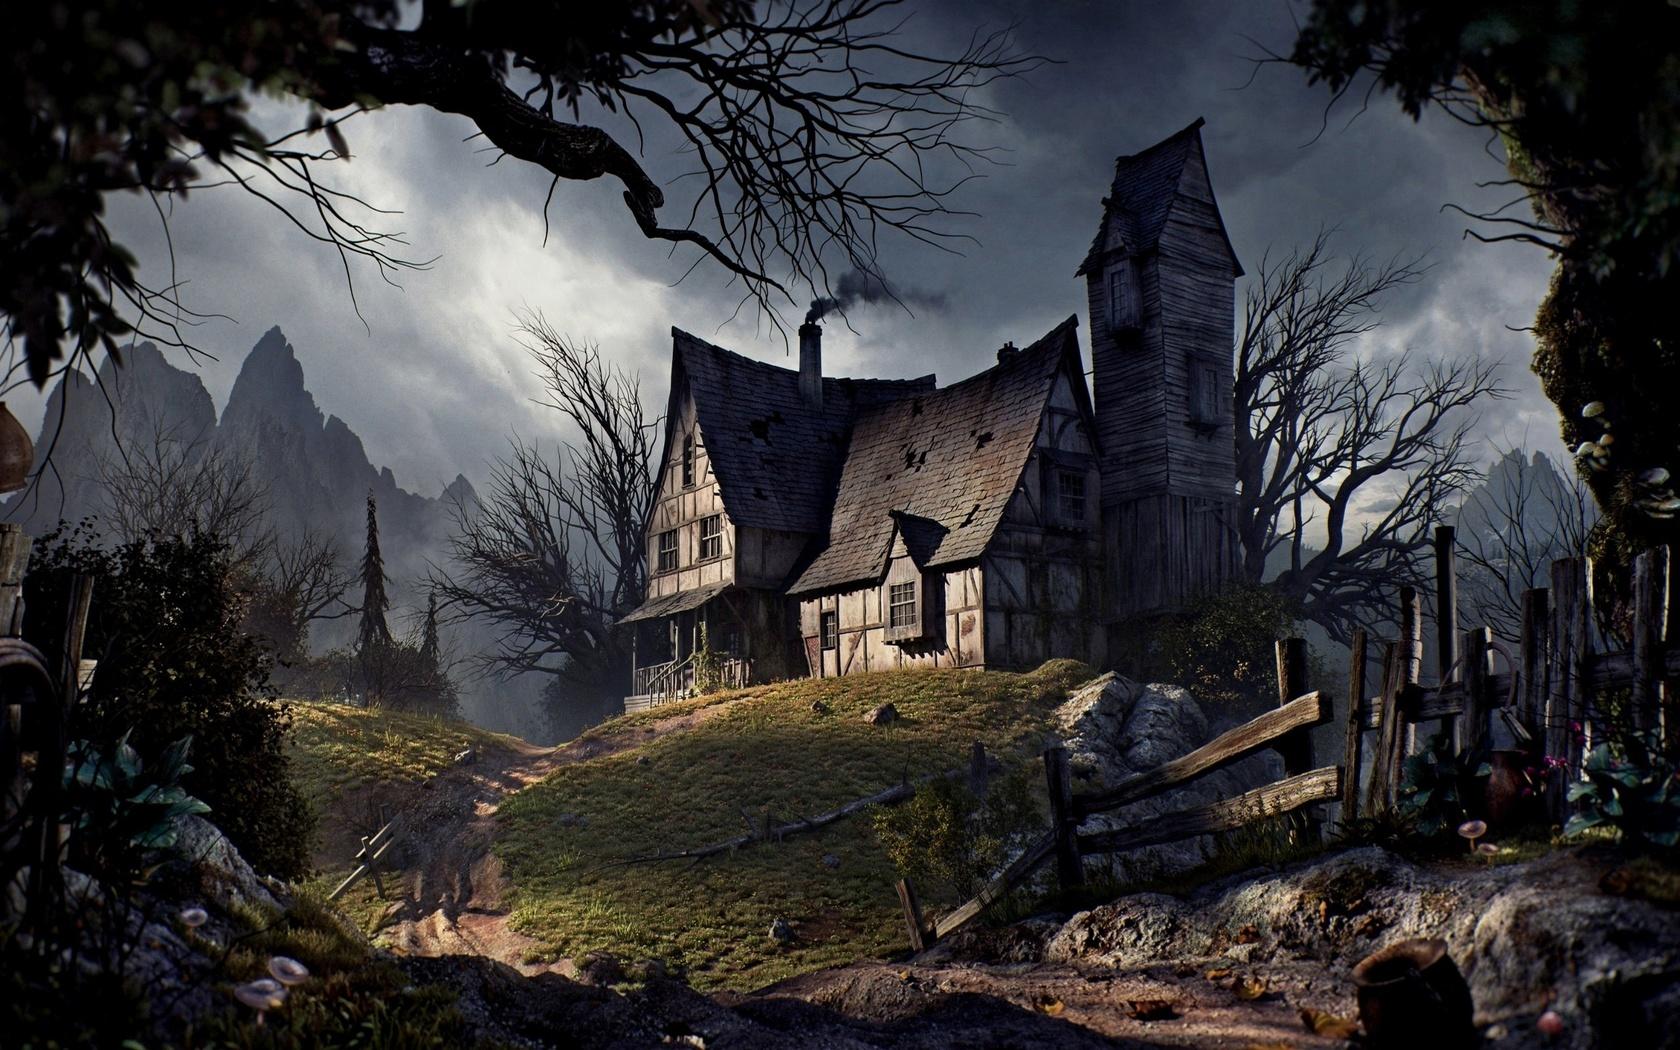 old house, halloween, road, fence, trees, mountains, старый дом, хэллоуин, дорога, забор, деревья, горы